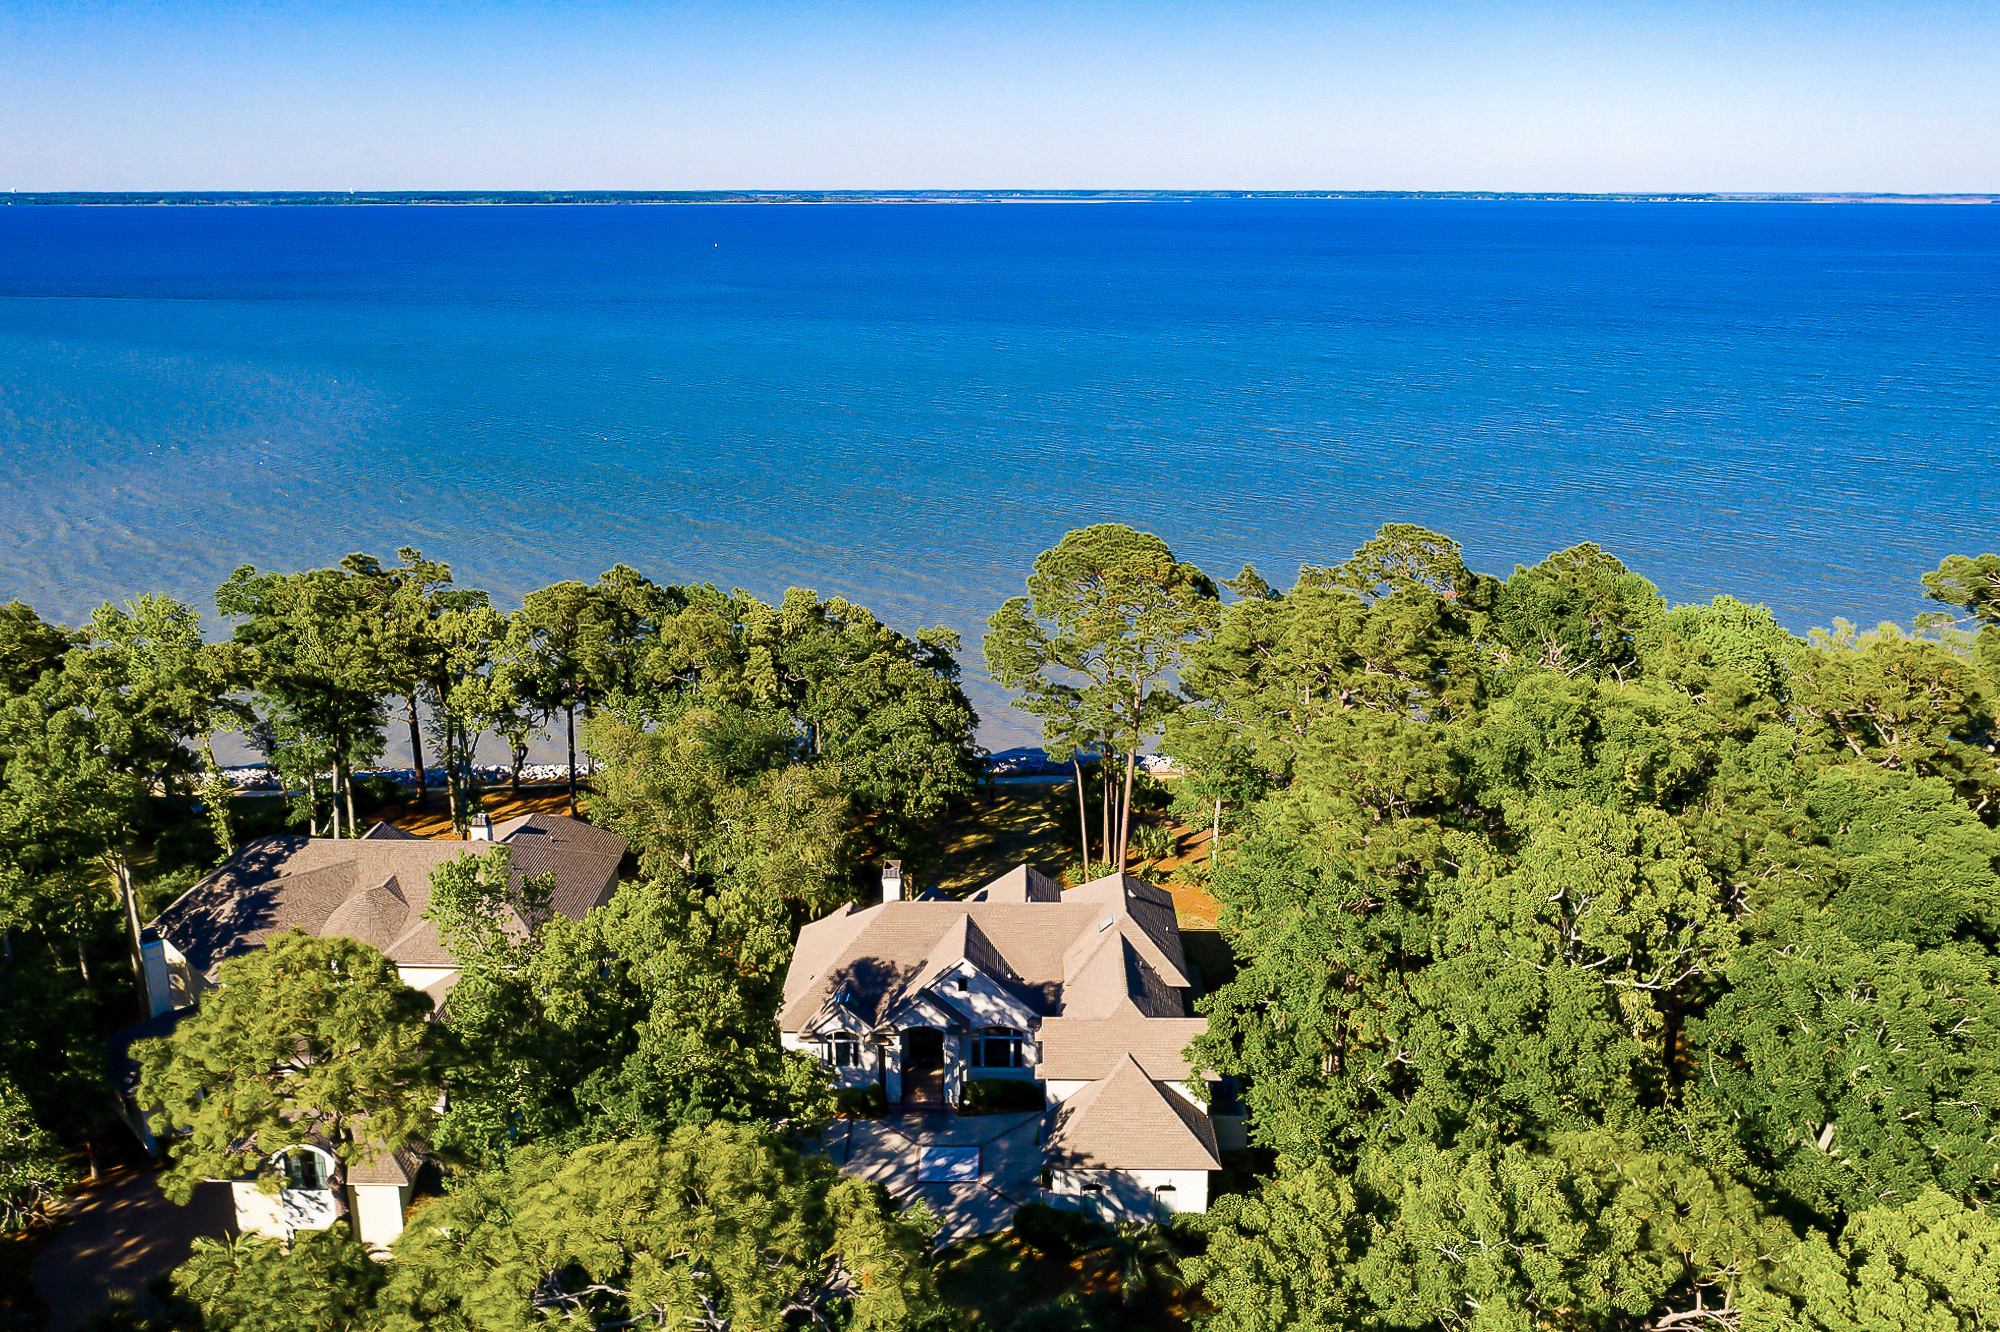 5 Angel Wing Drive, Hilton Head Island, SC Hilton Head Plantation